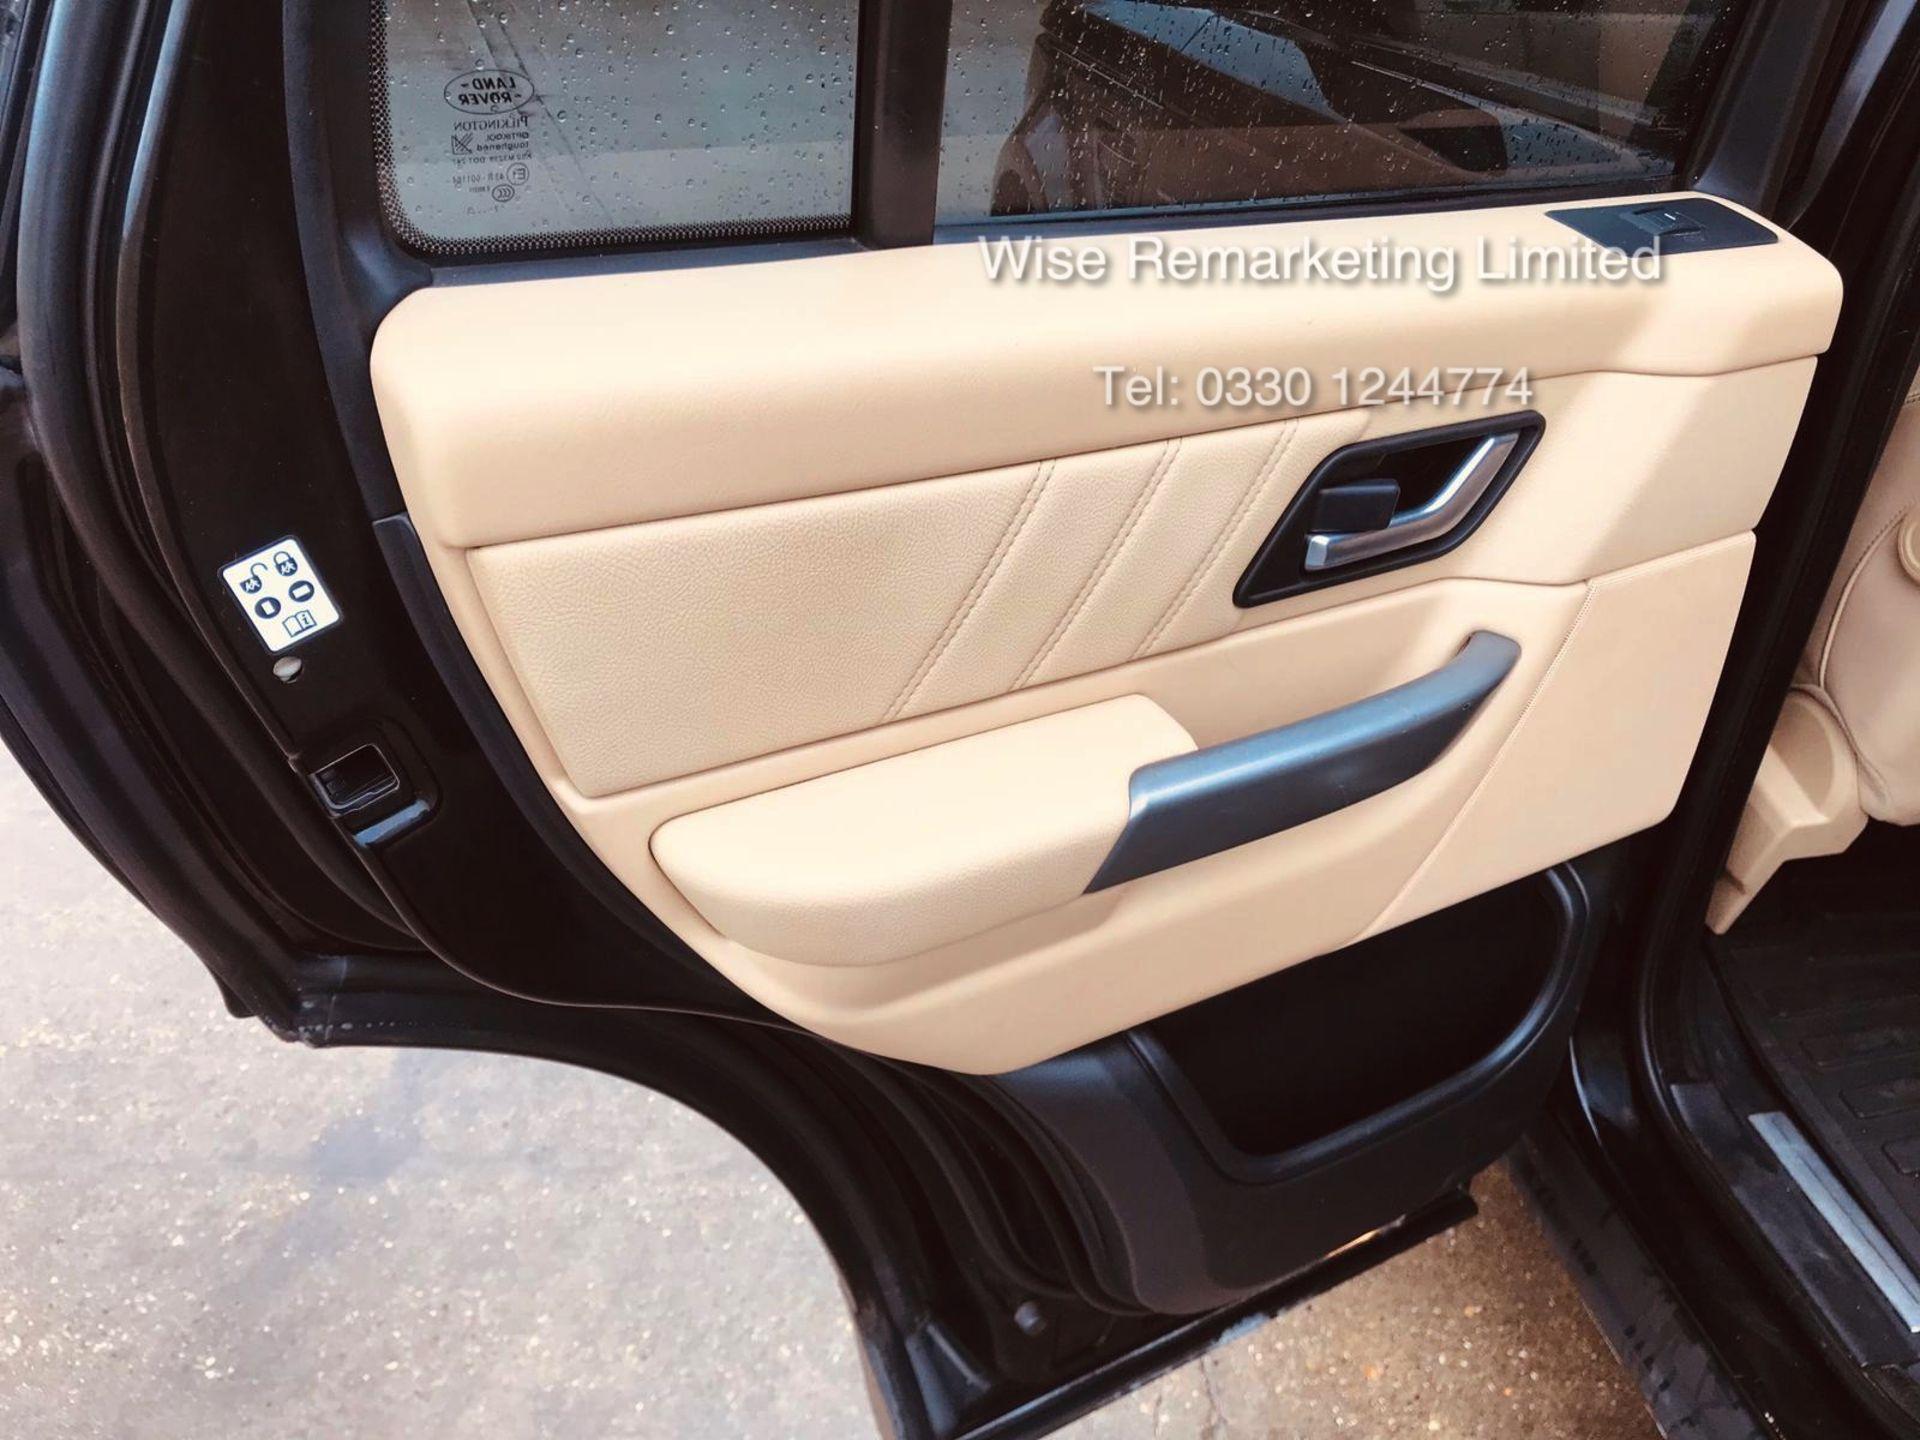 Range Rover Sport 2.7 TDV6 HSE Auto - 2008 Model - Cream Leather - Sat Nav - Heated Seats - Image 18 of 19